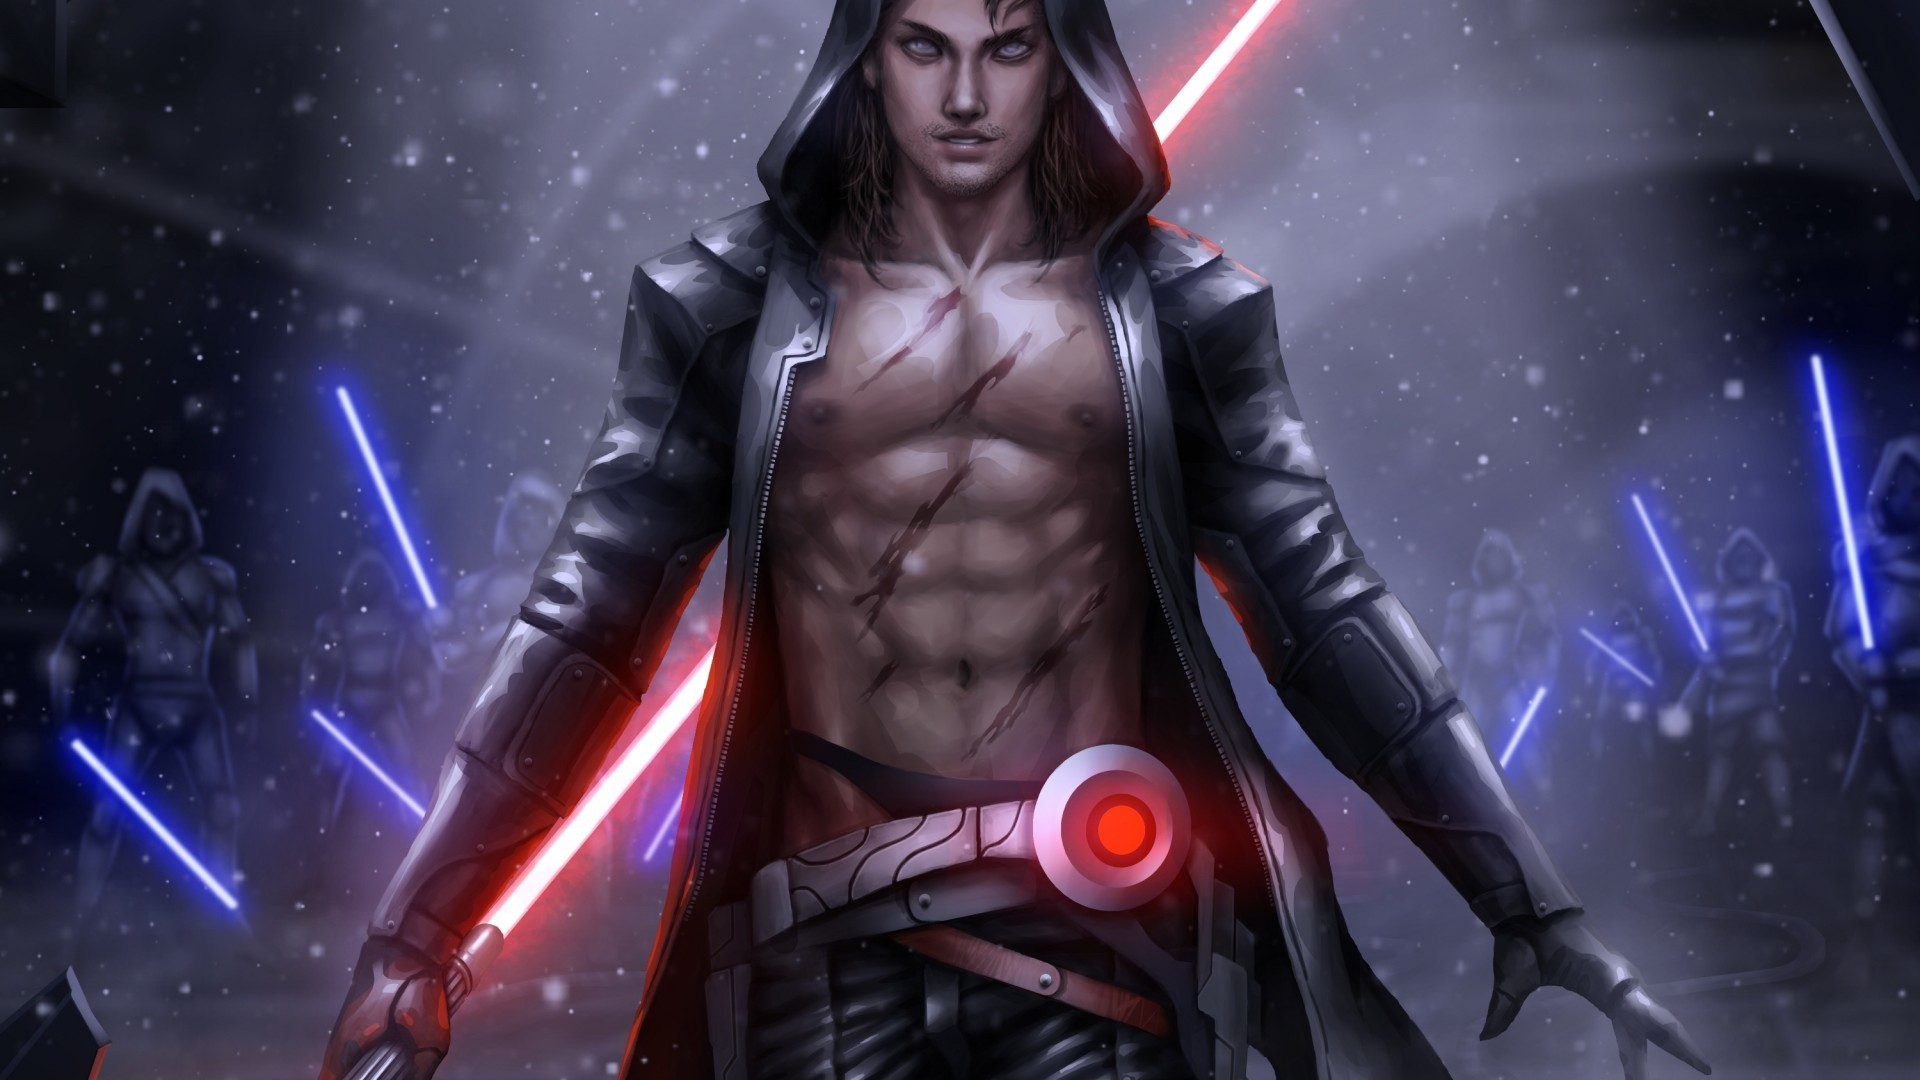 Sith Vs Jedi Wallpaper 77 Images